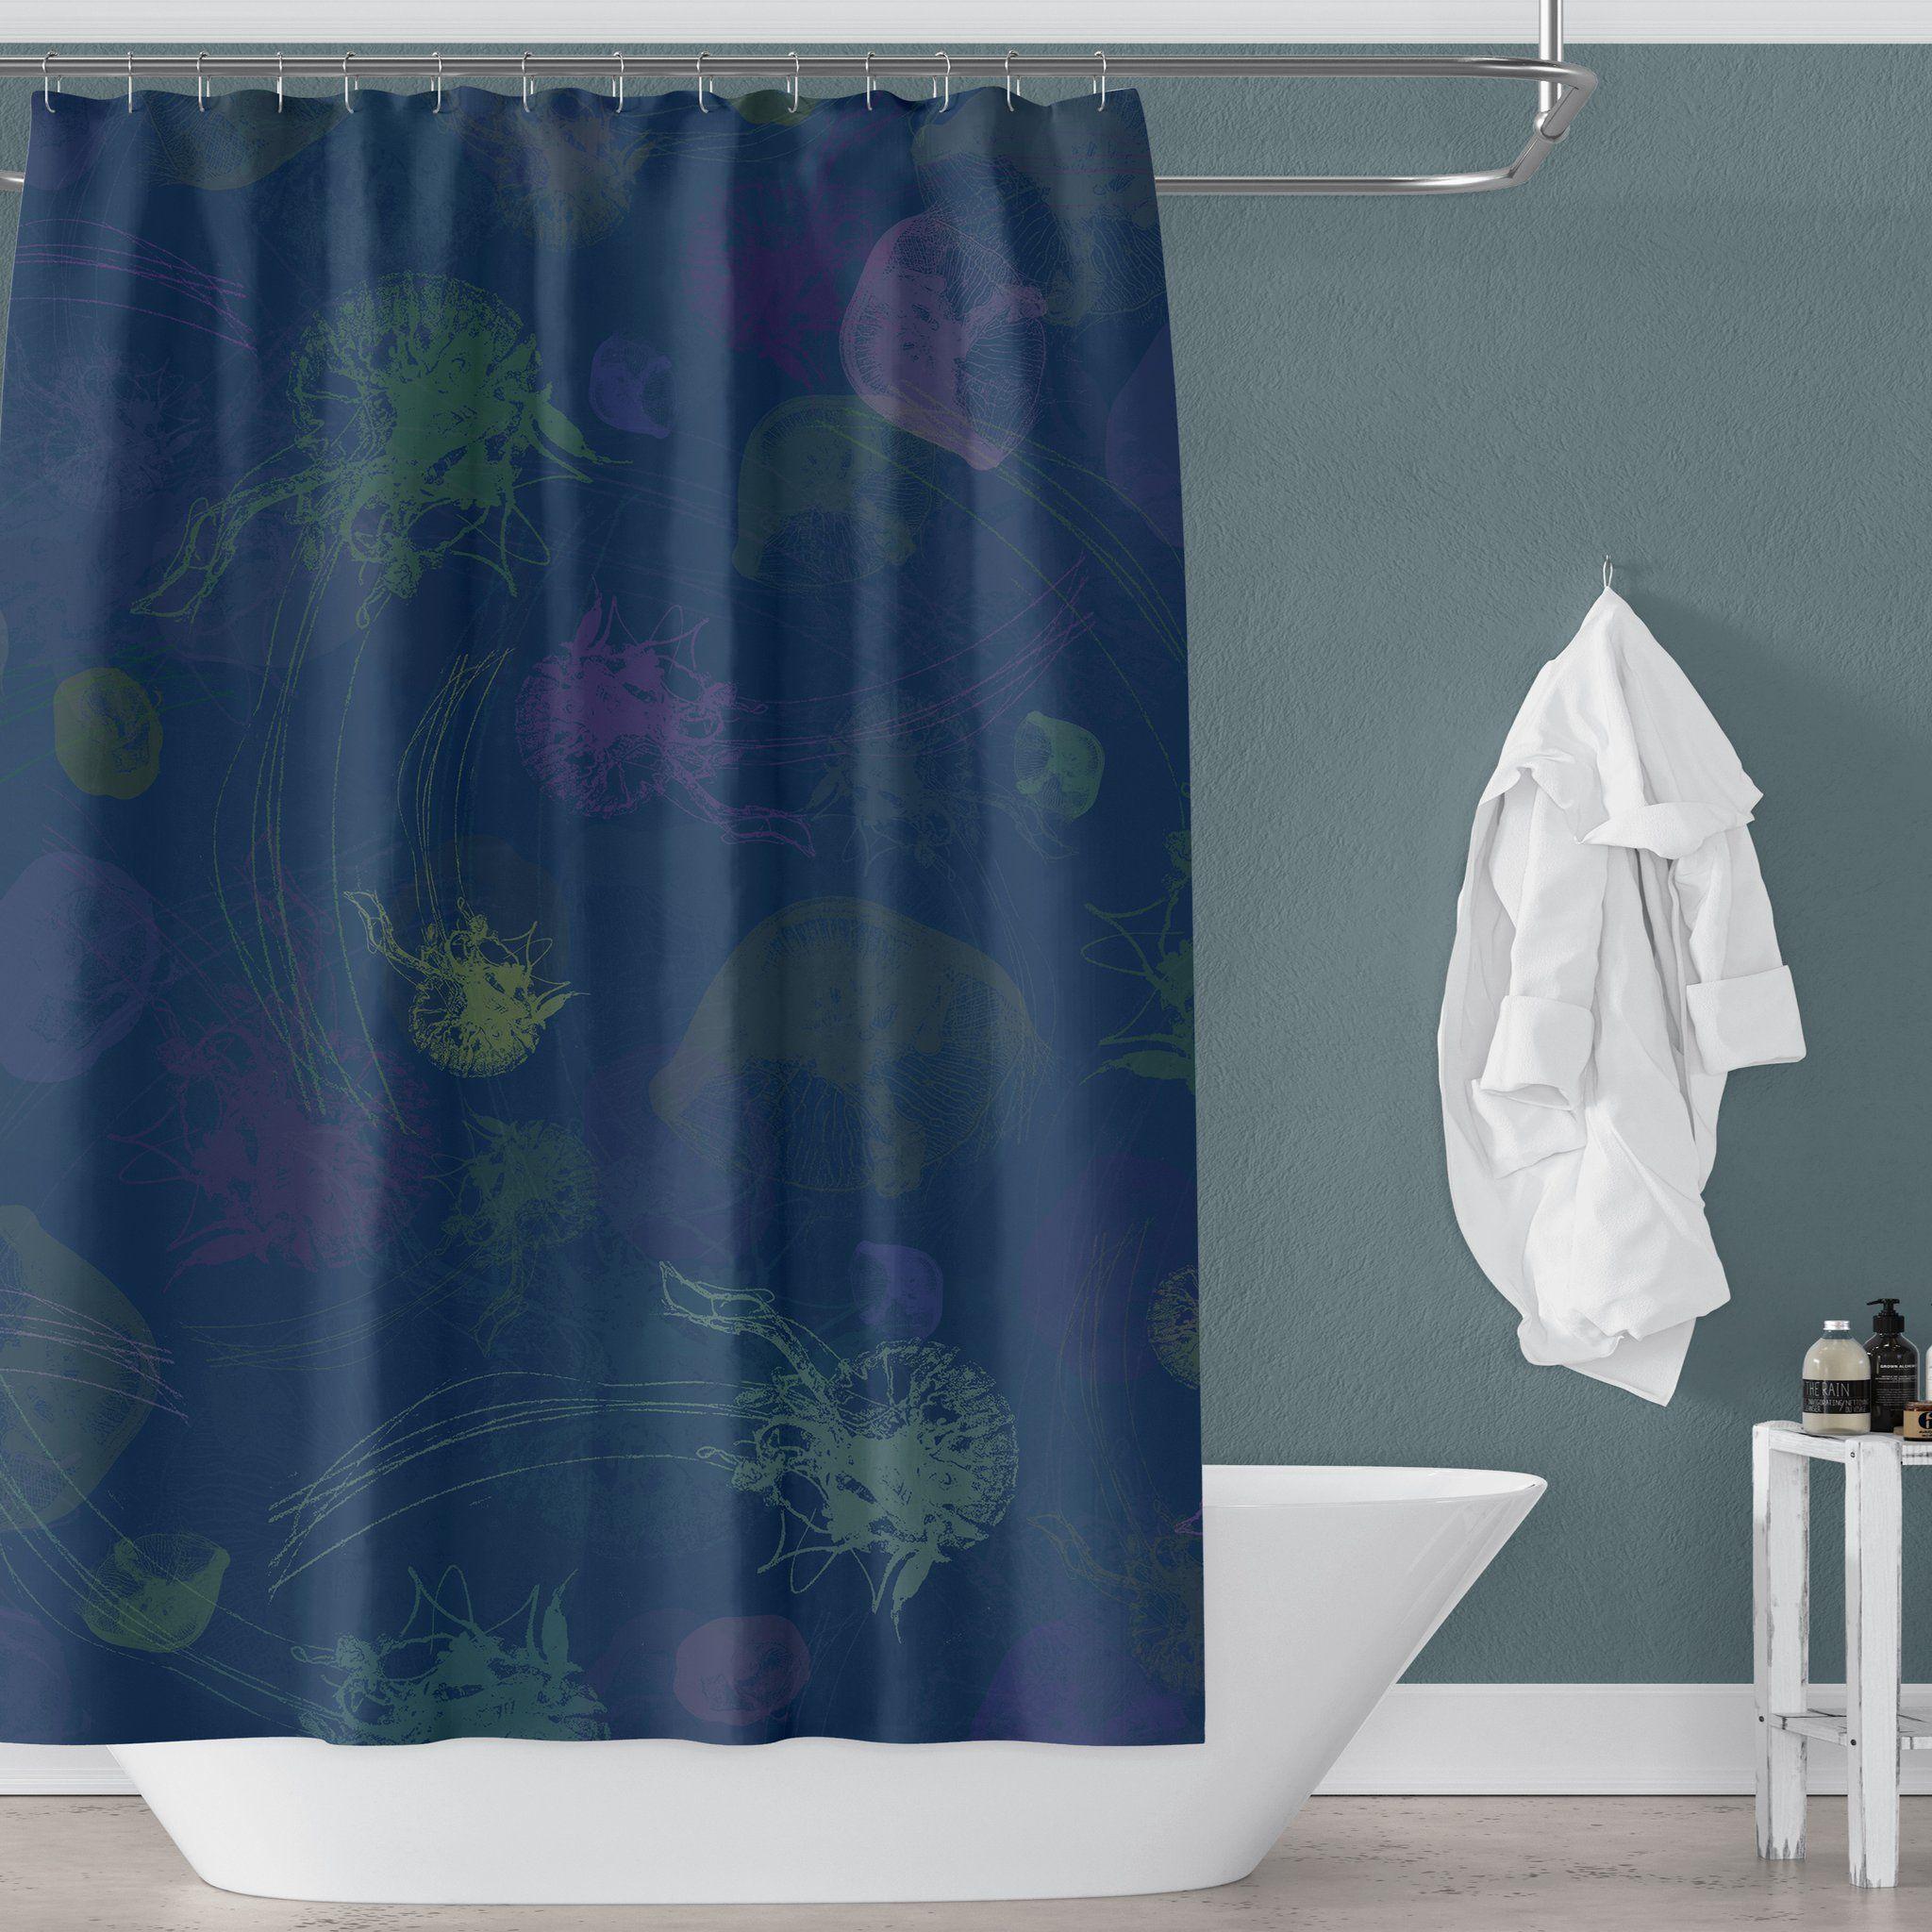 Blue Jellyfish Shower Curtain For Kids Ocean Bathroom Printed